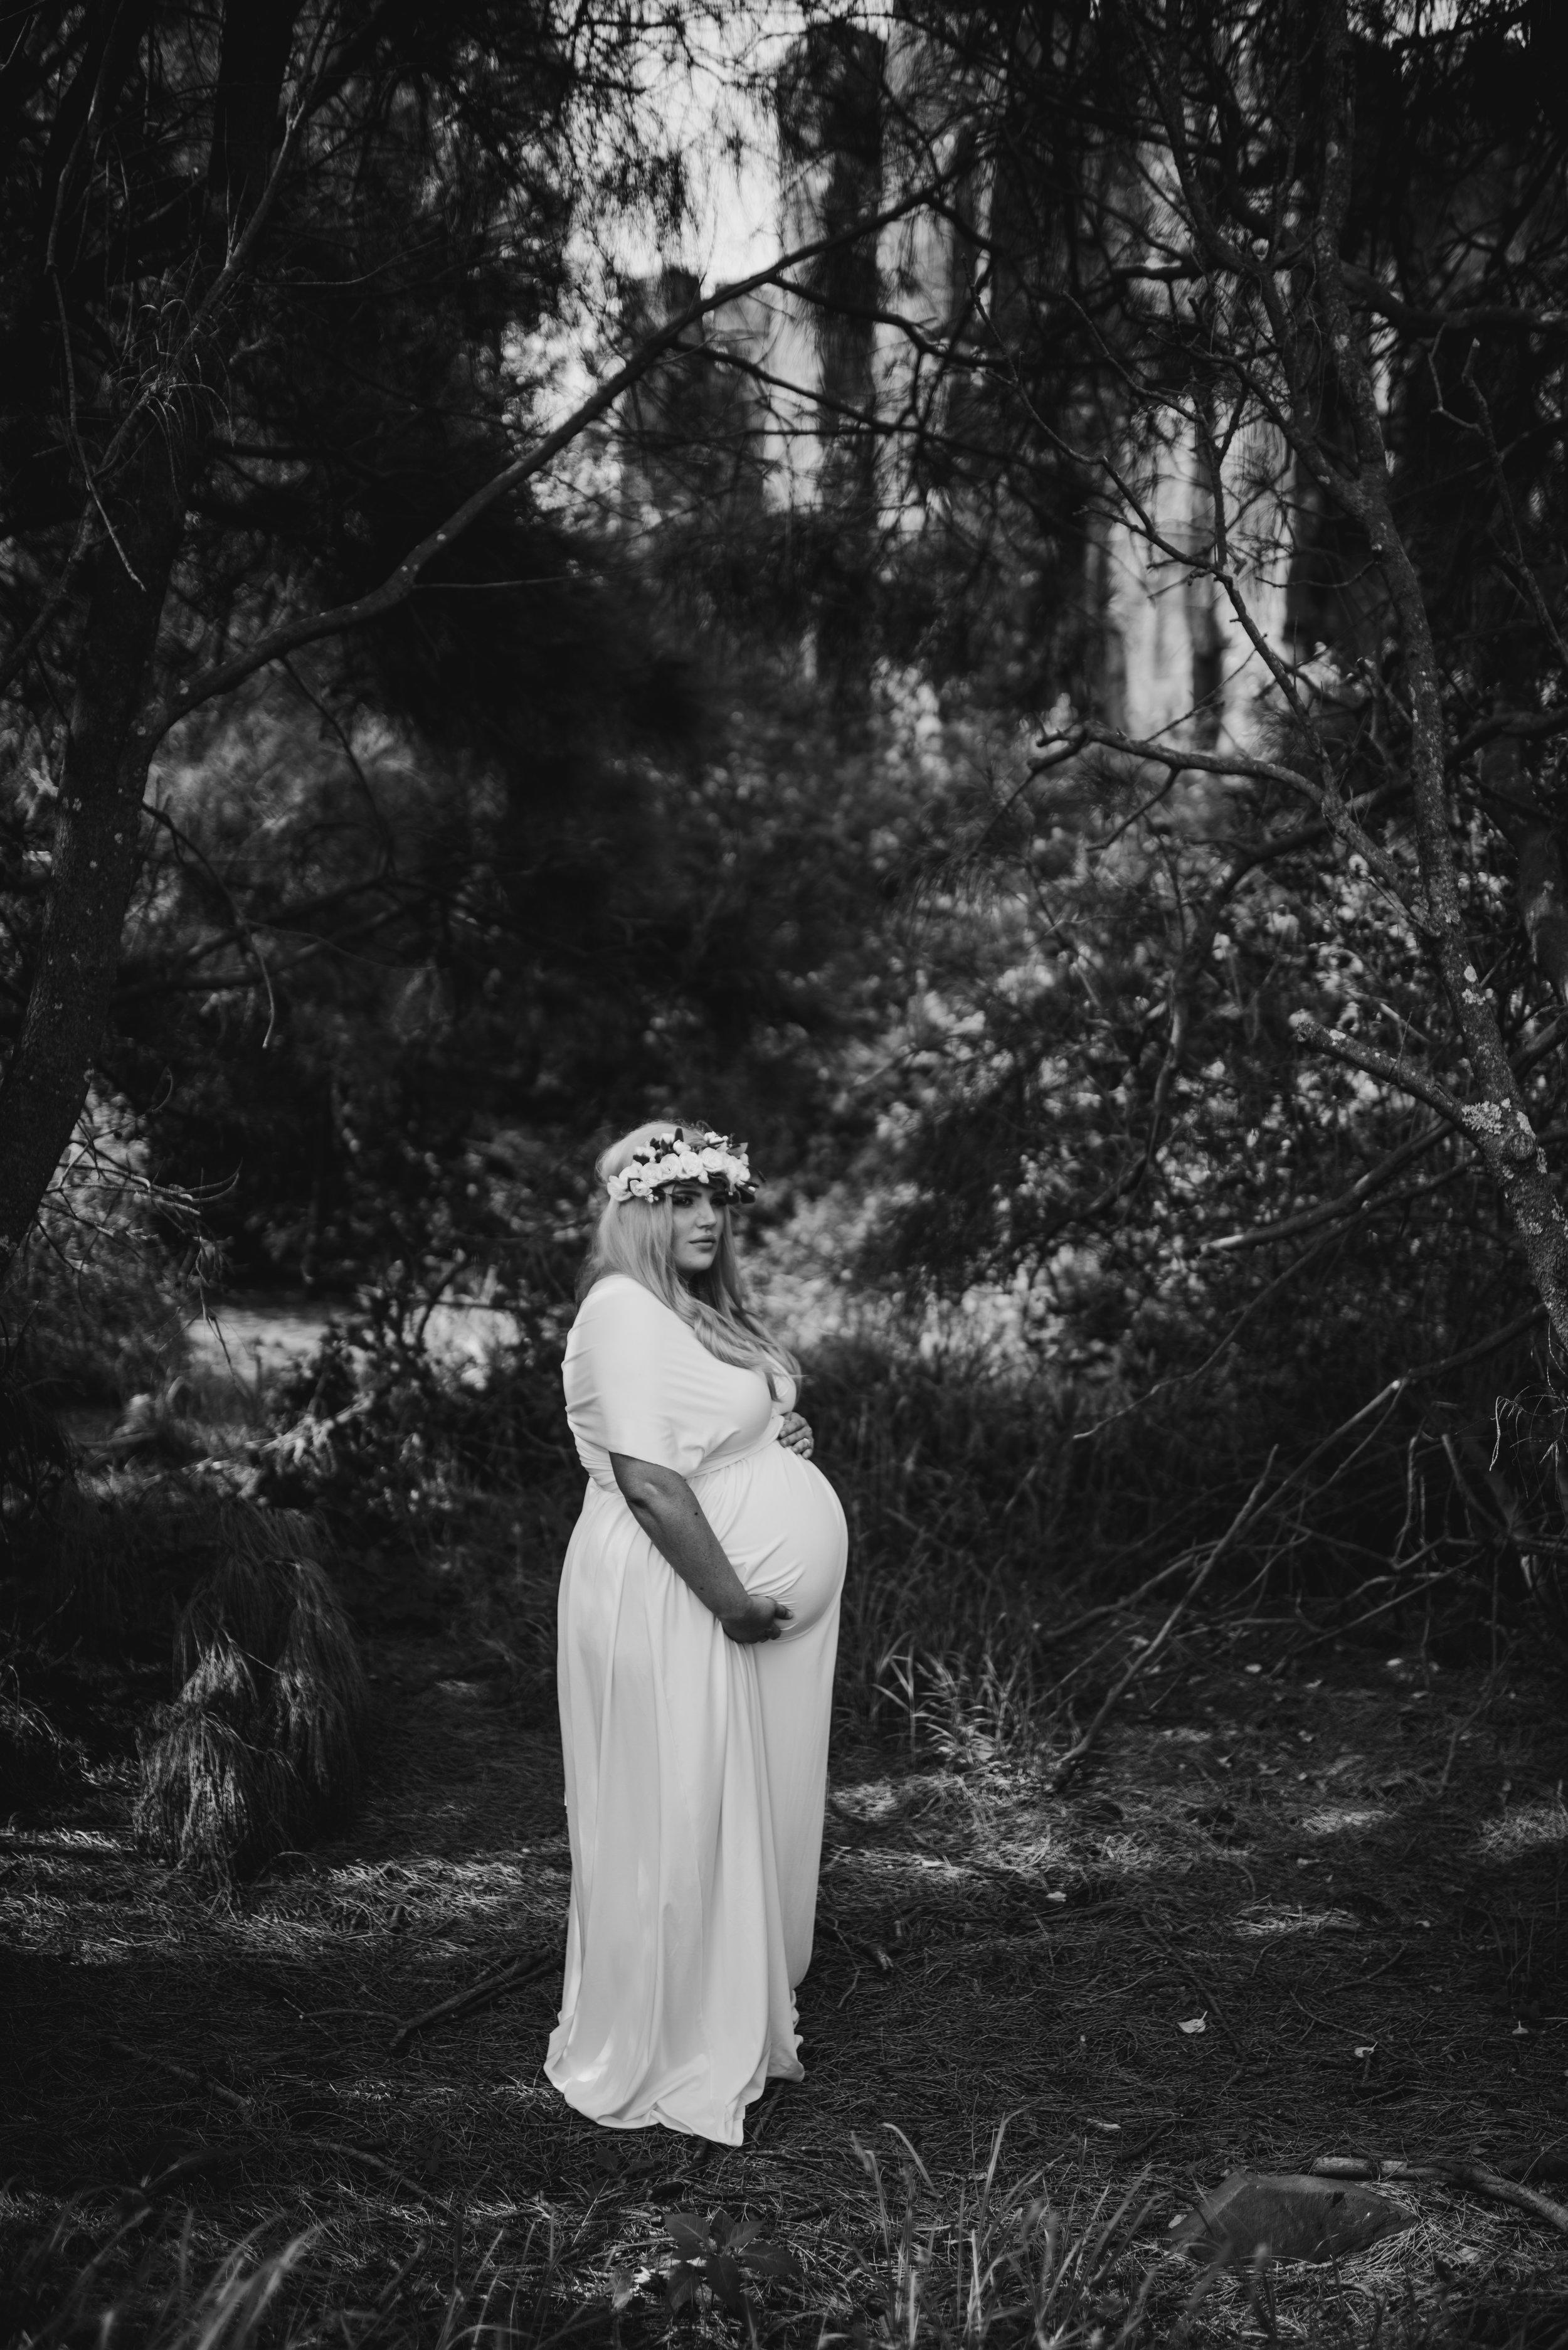 S&A - Maternity-2.jpg